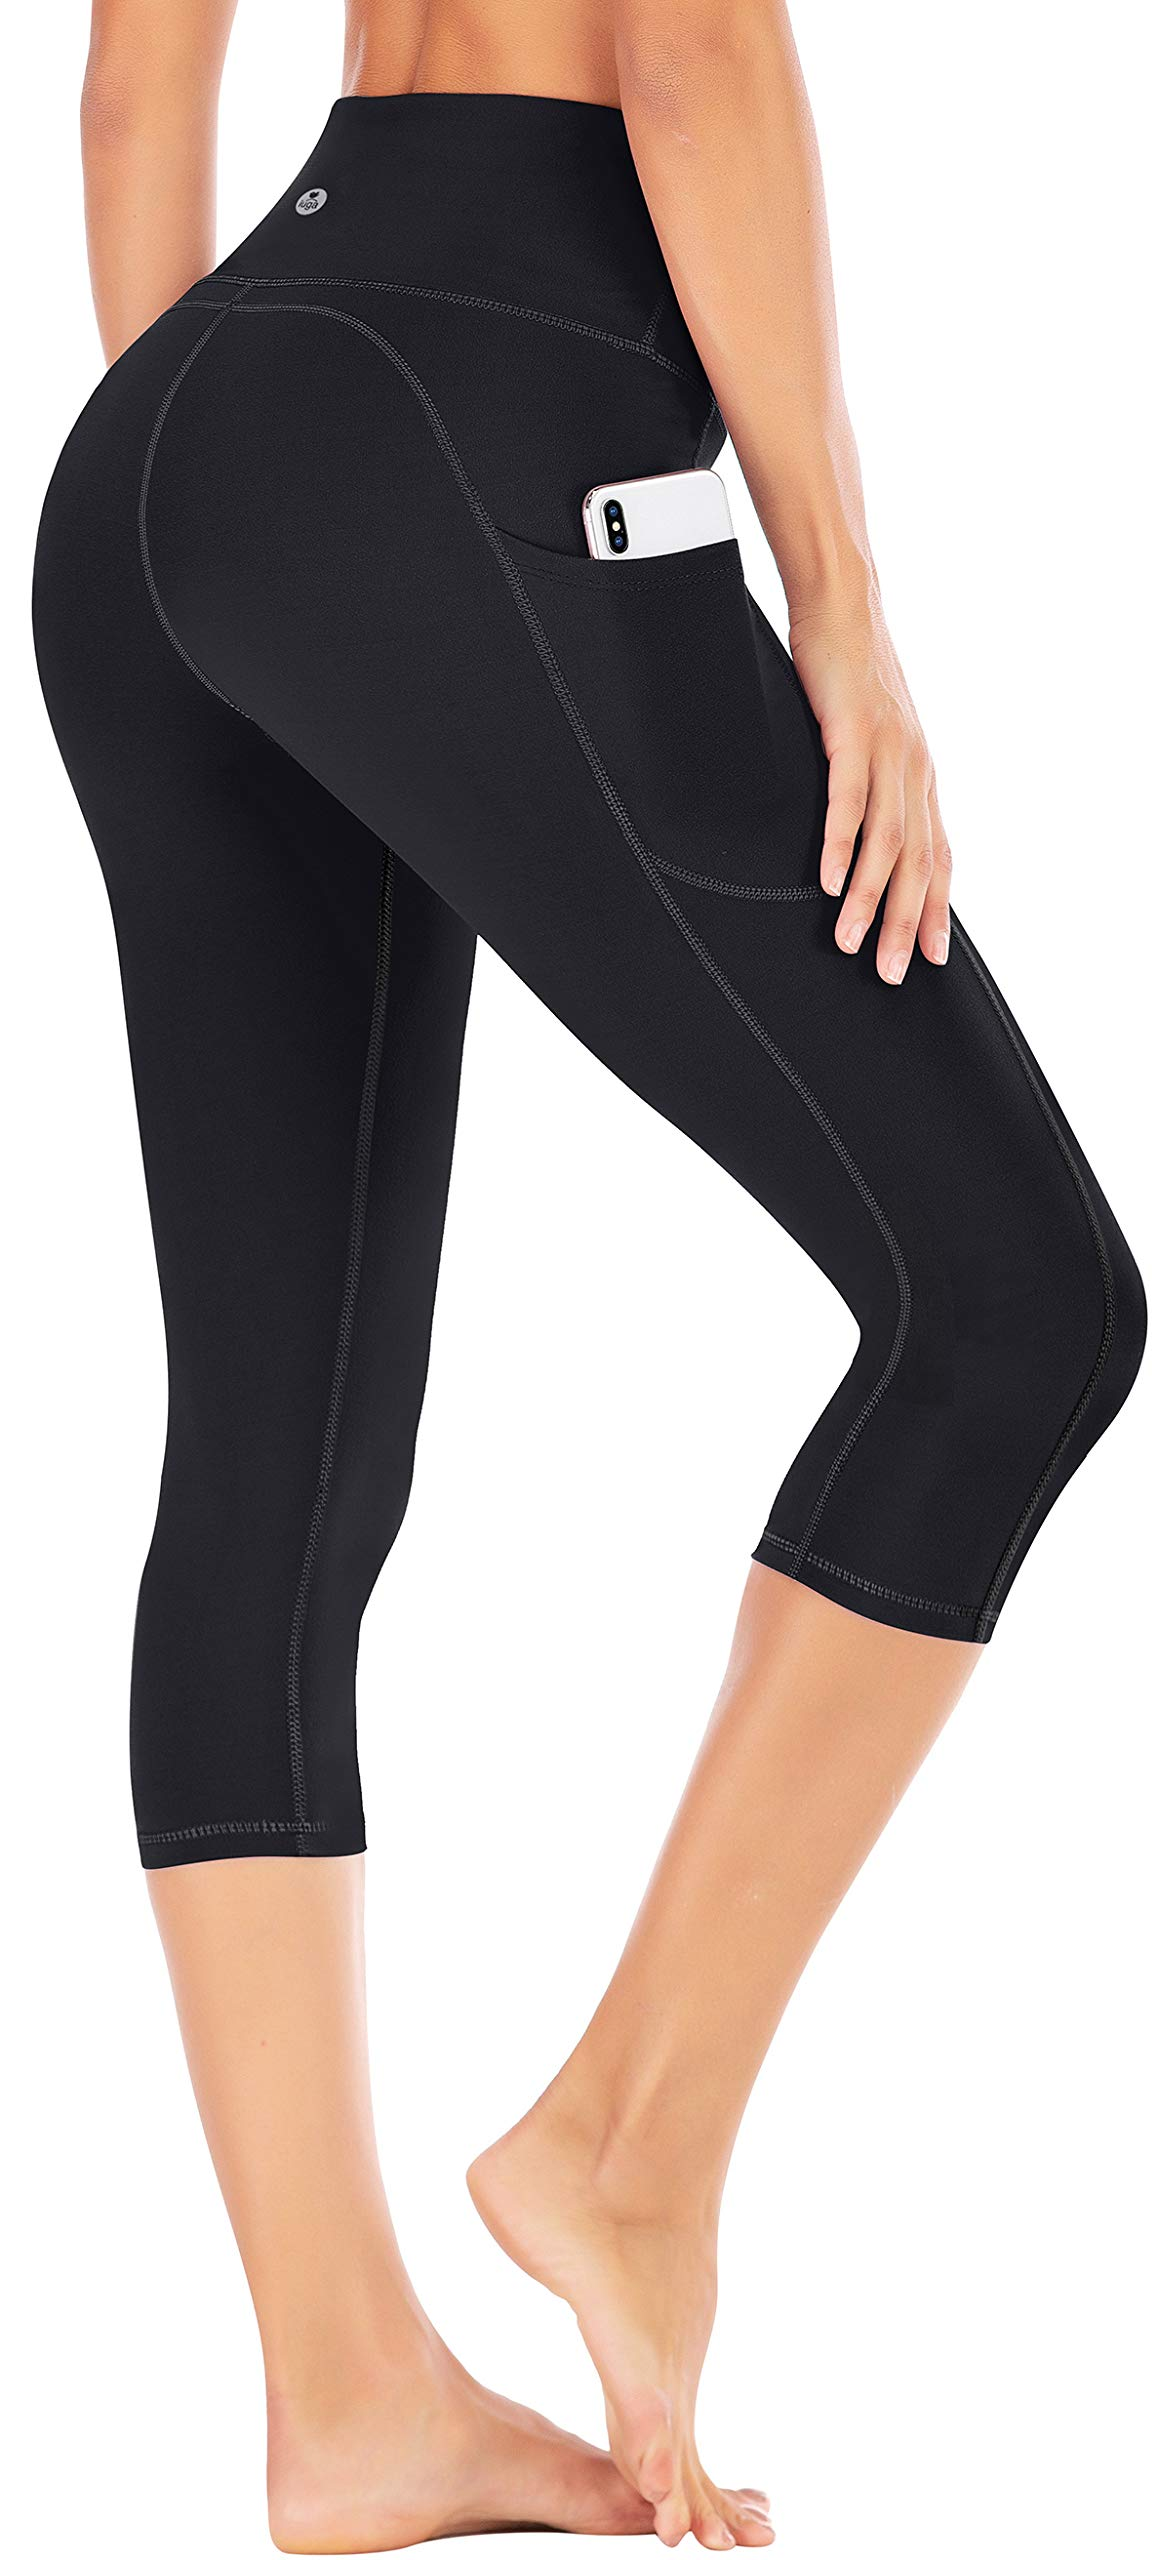 IUGA High Waist Yoga Pants with Pockets, Tummy Control Yoga Capris for Women, 4 Way Stretch Capri Leggings with Pockets(Black, XL) by IUGA